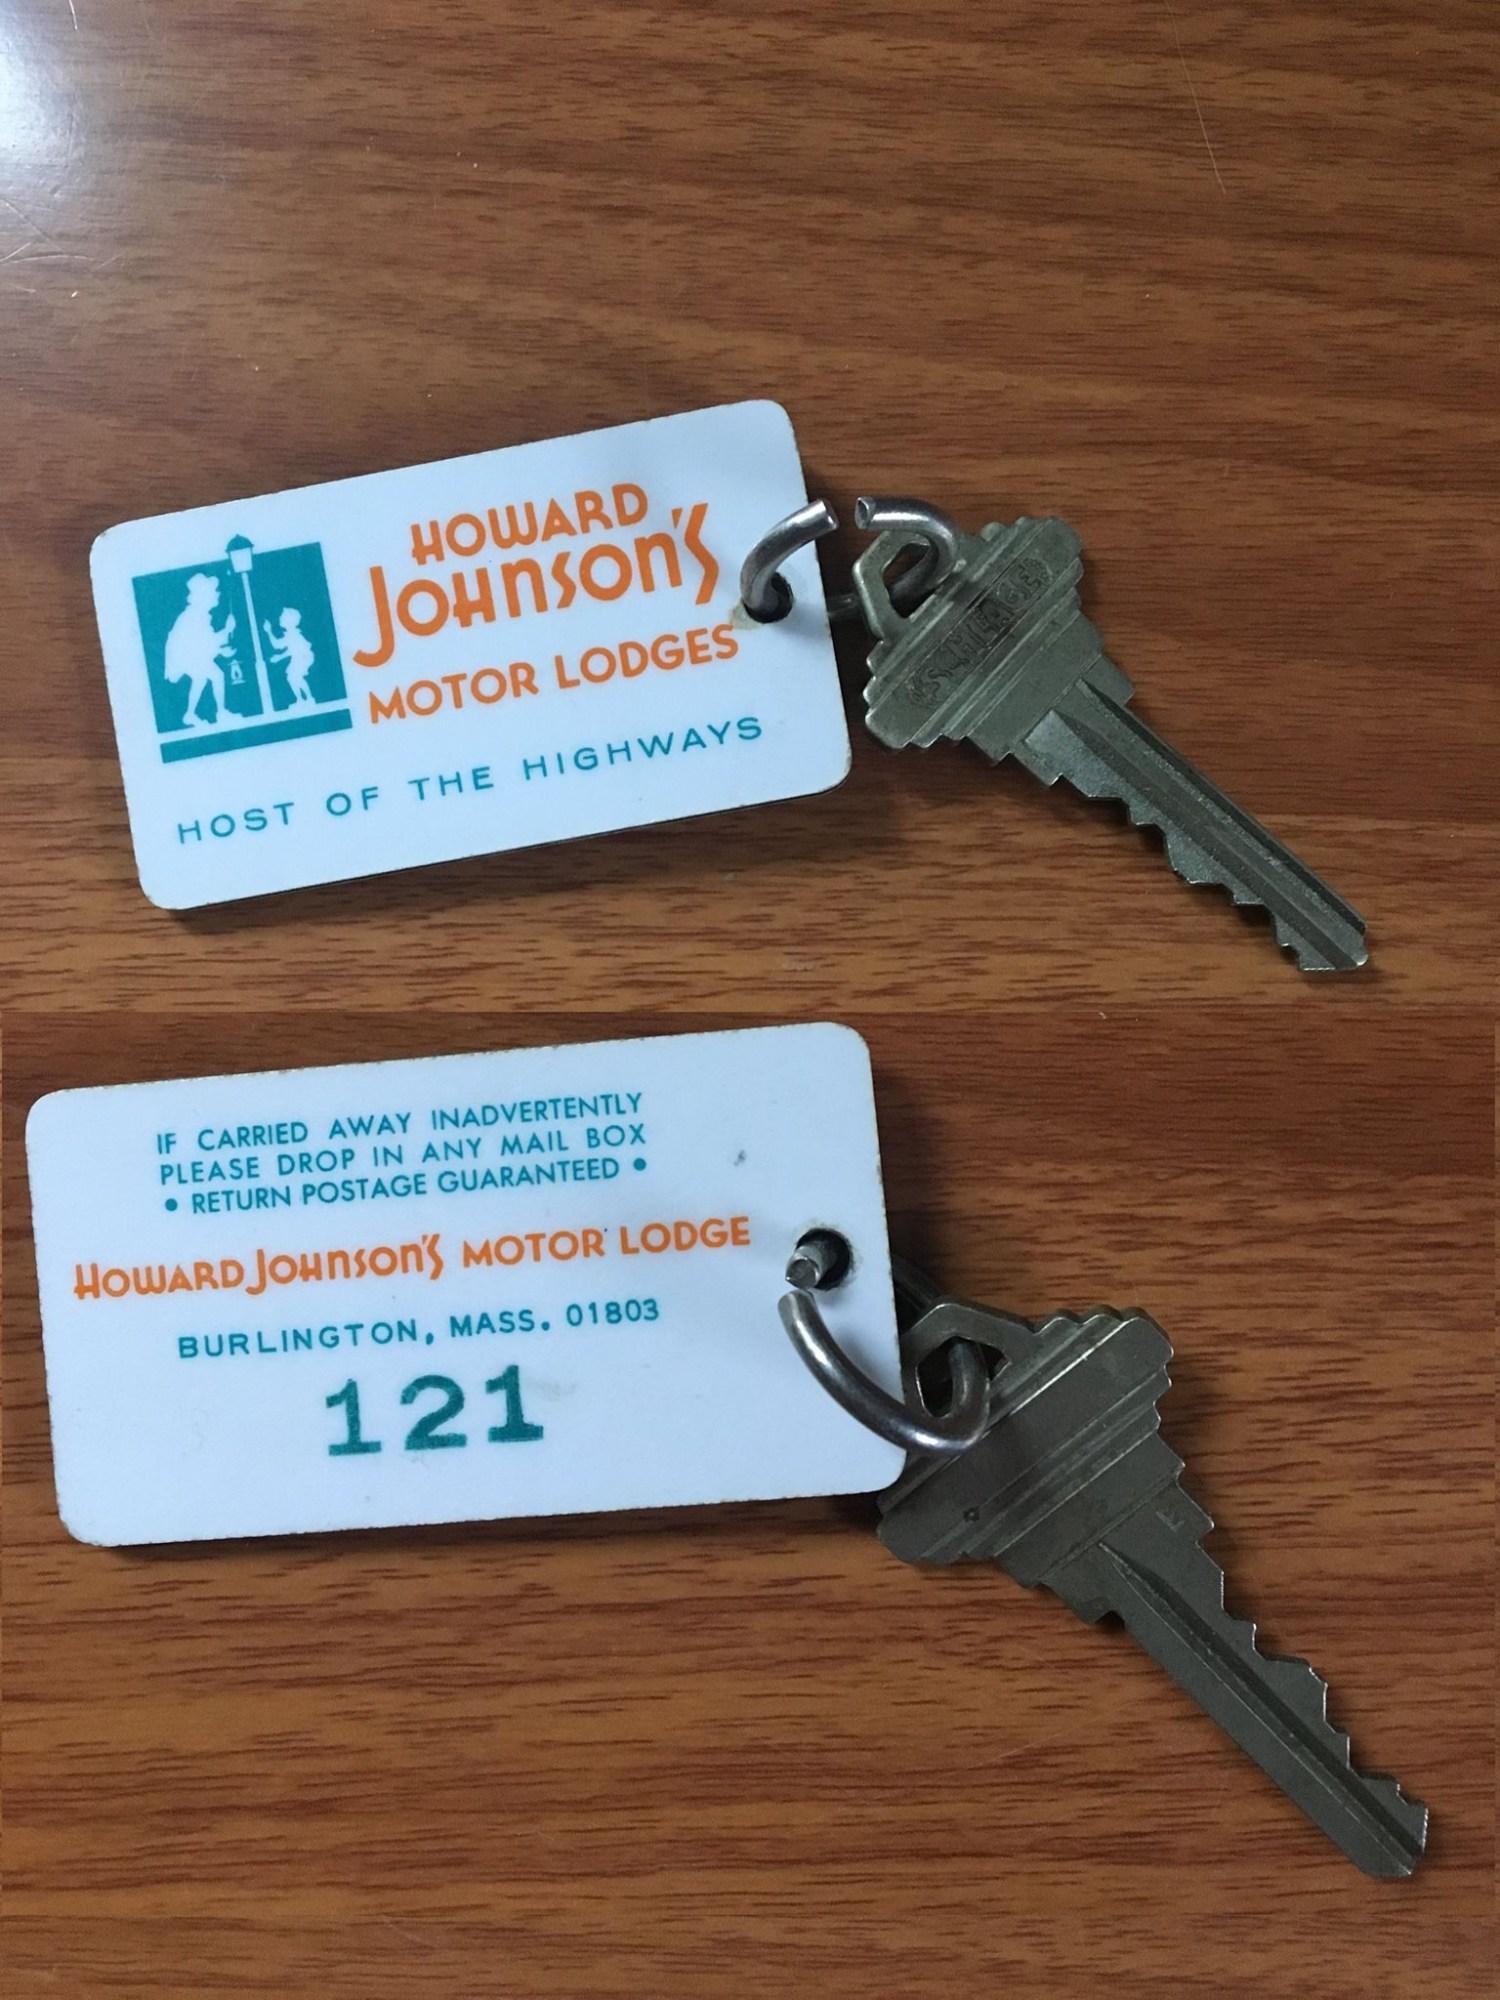 Howard Johnson's Motor Lodge keys, Burlington MA. Photo credit: Greg Purvis